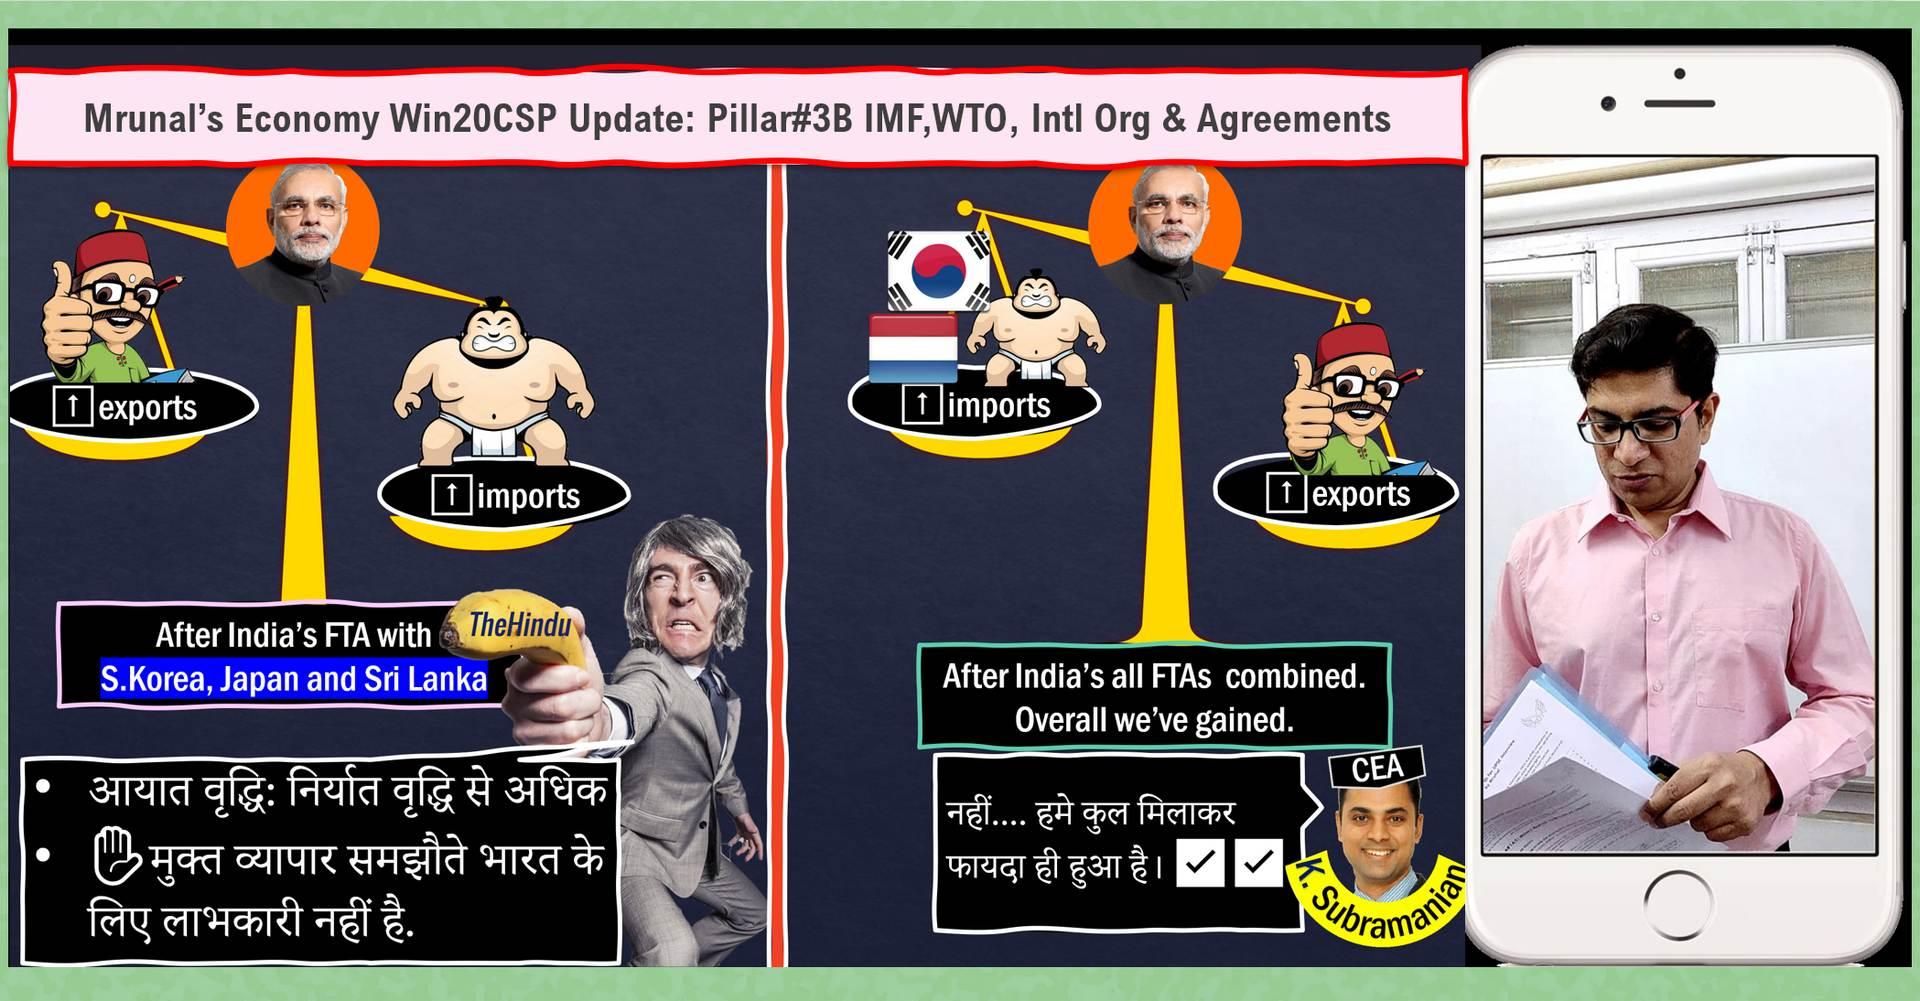 [Win20CSP] Mrunal's Free Economy Update Lecture#8: IMF,WTO,RCEP,D10 & More Updates in Pillar3B